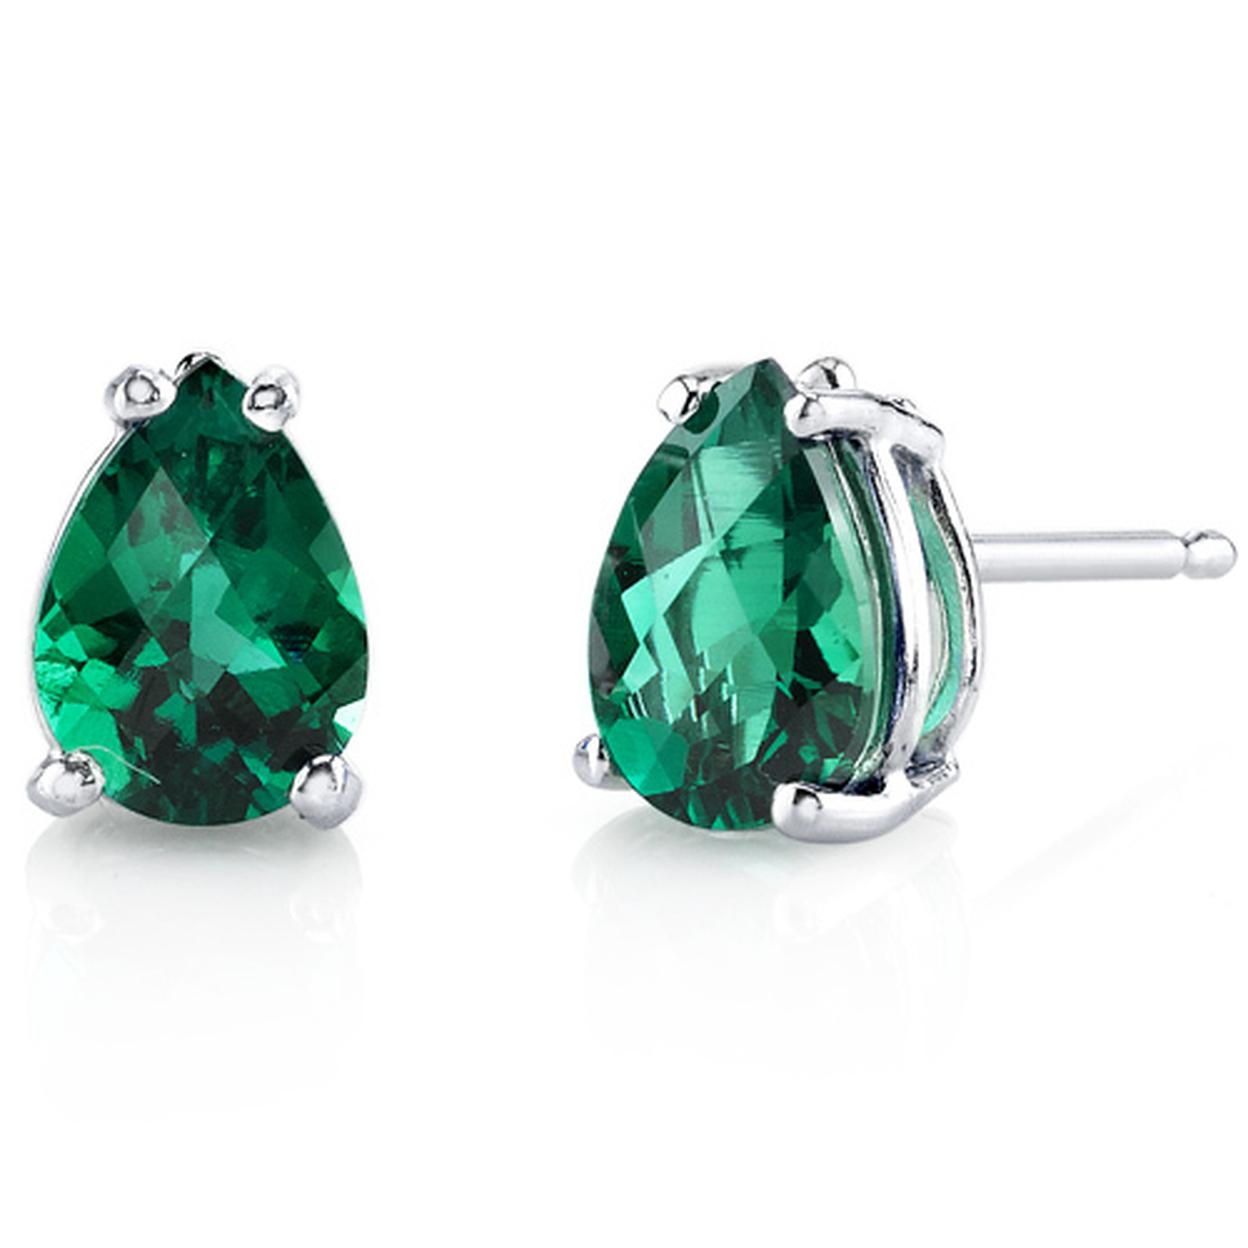 14 Karat White Gold Pear Shape 1.25 Carats Created Emerald Stud Earrings